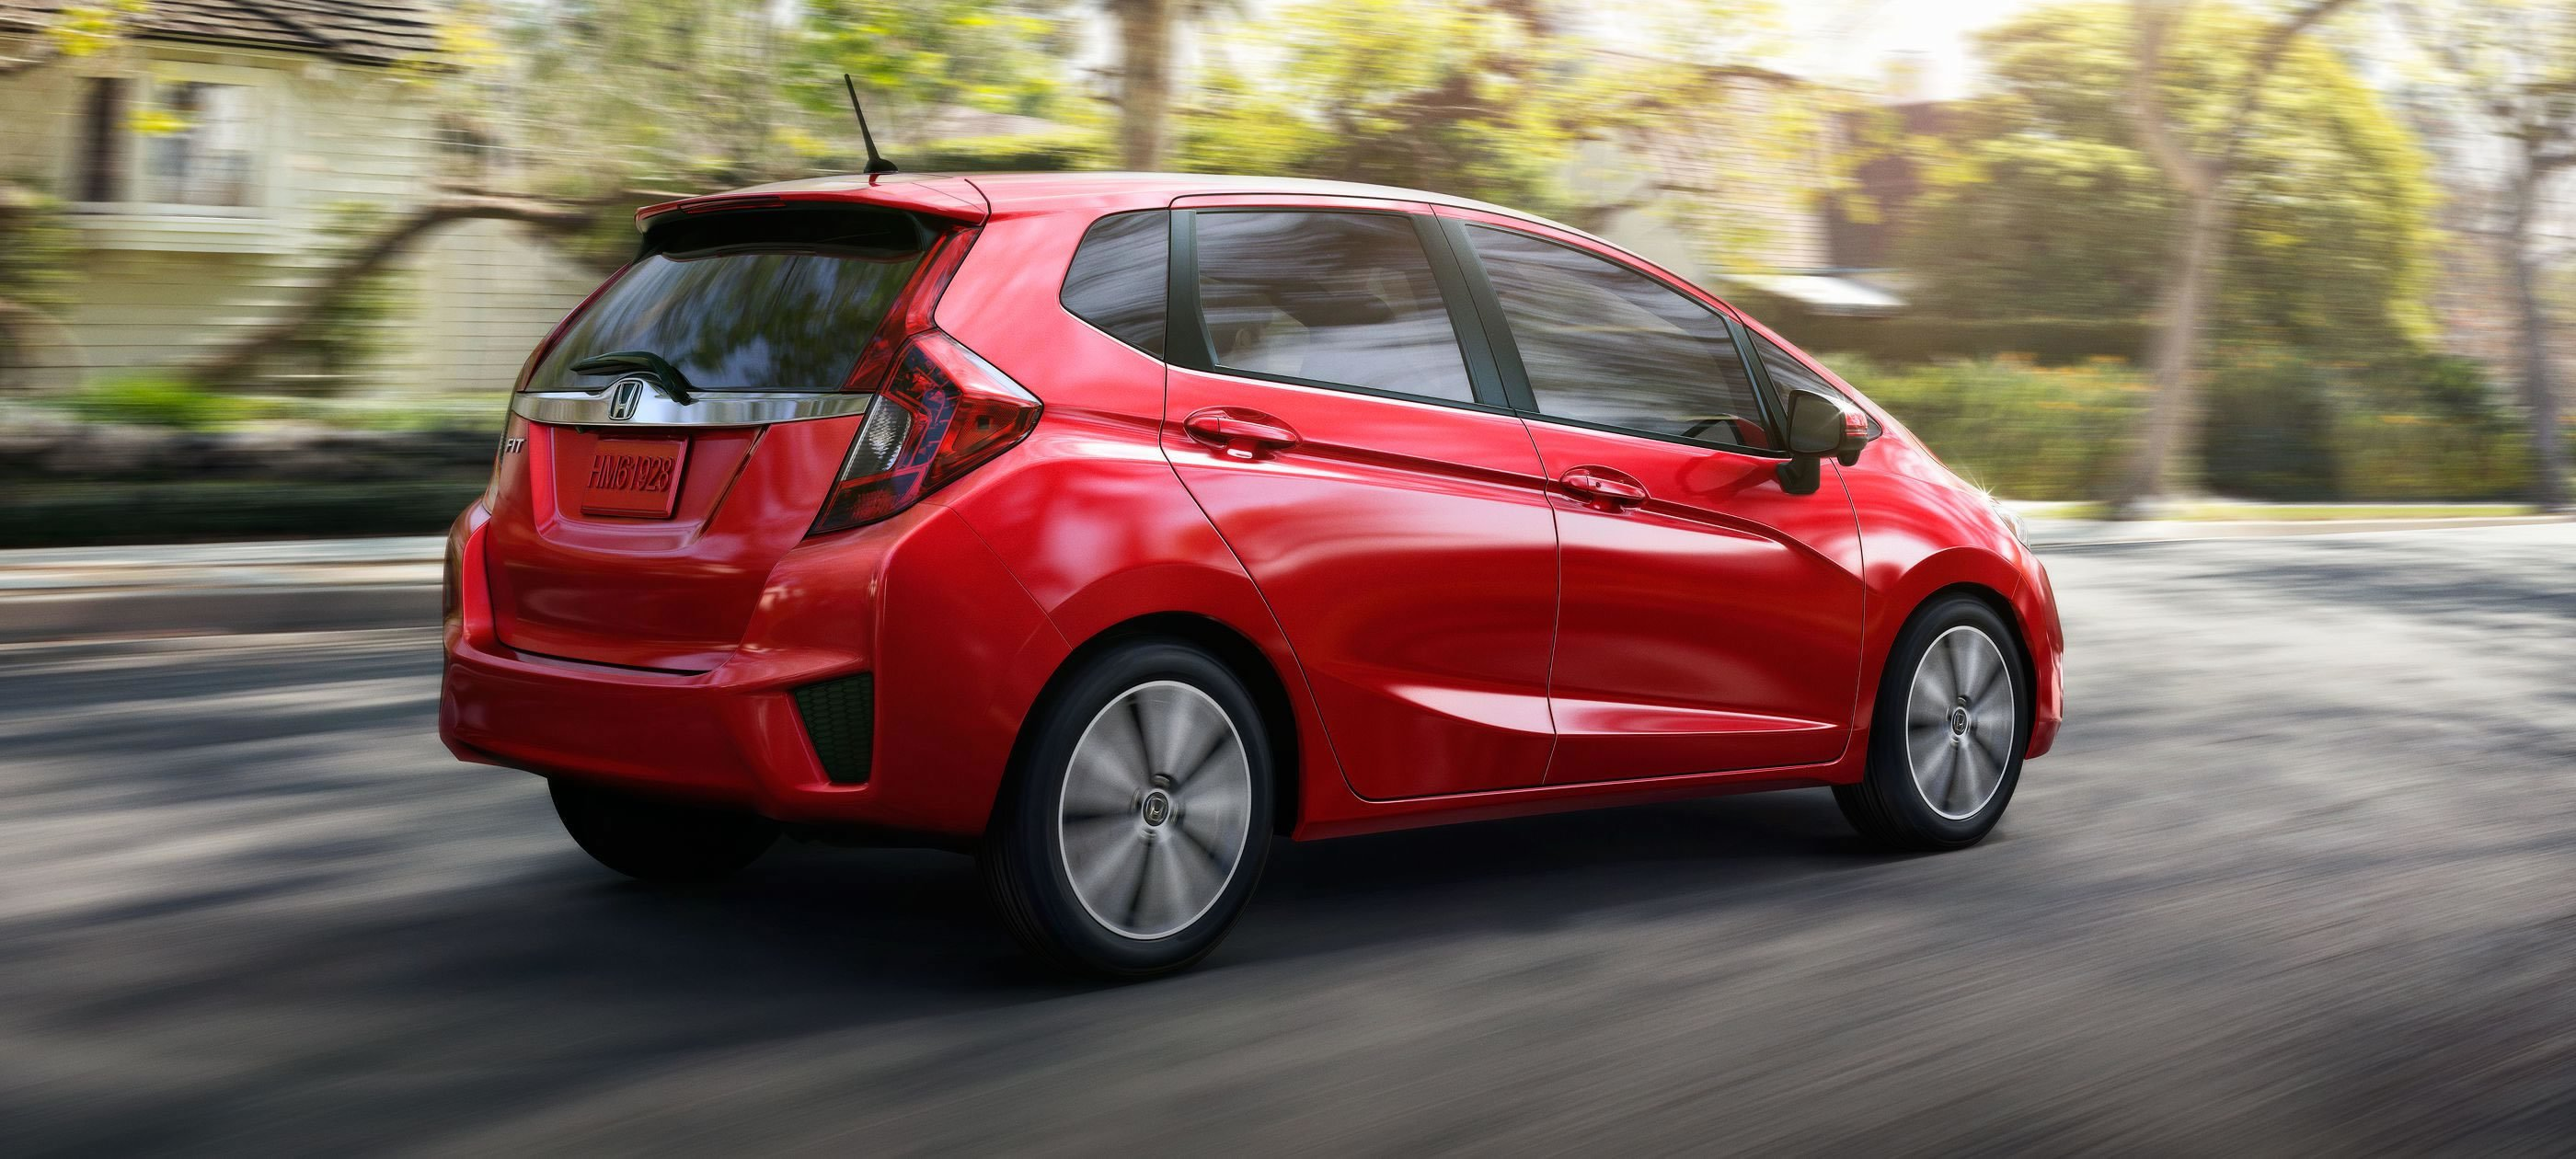 Honda fit lease deals ma lamoureph blog for Honda lease deals